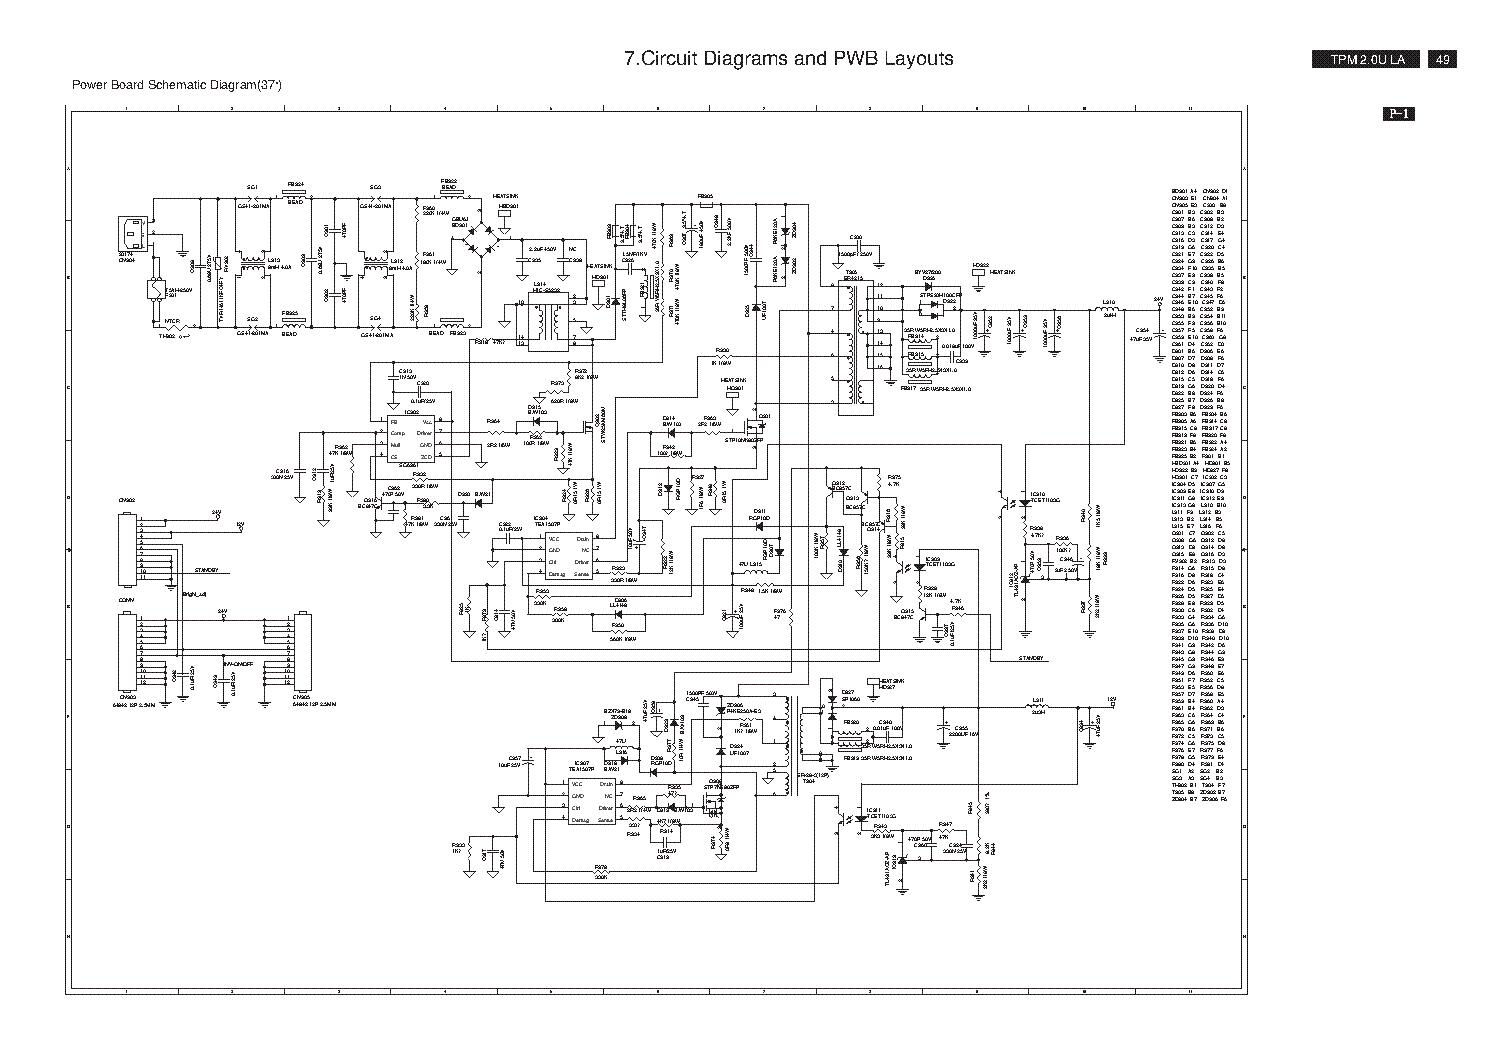 philips ba3af0f0102 1 power supply sch service manual download  schematics  eeprom  repair info